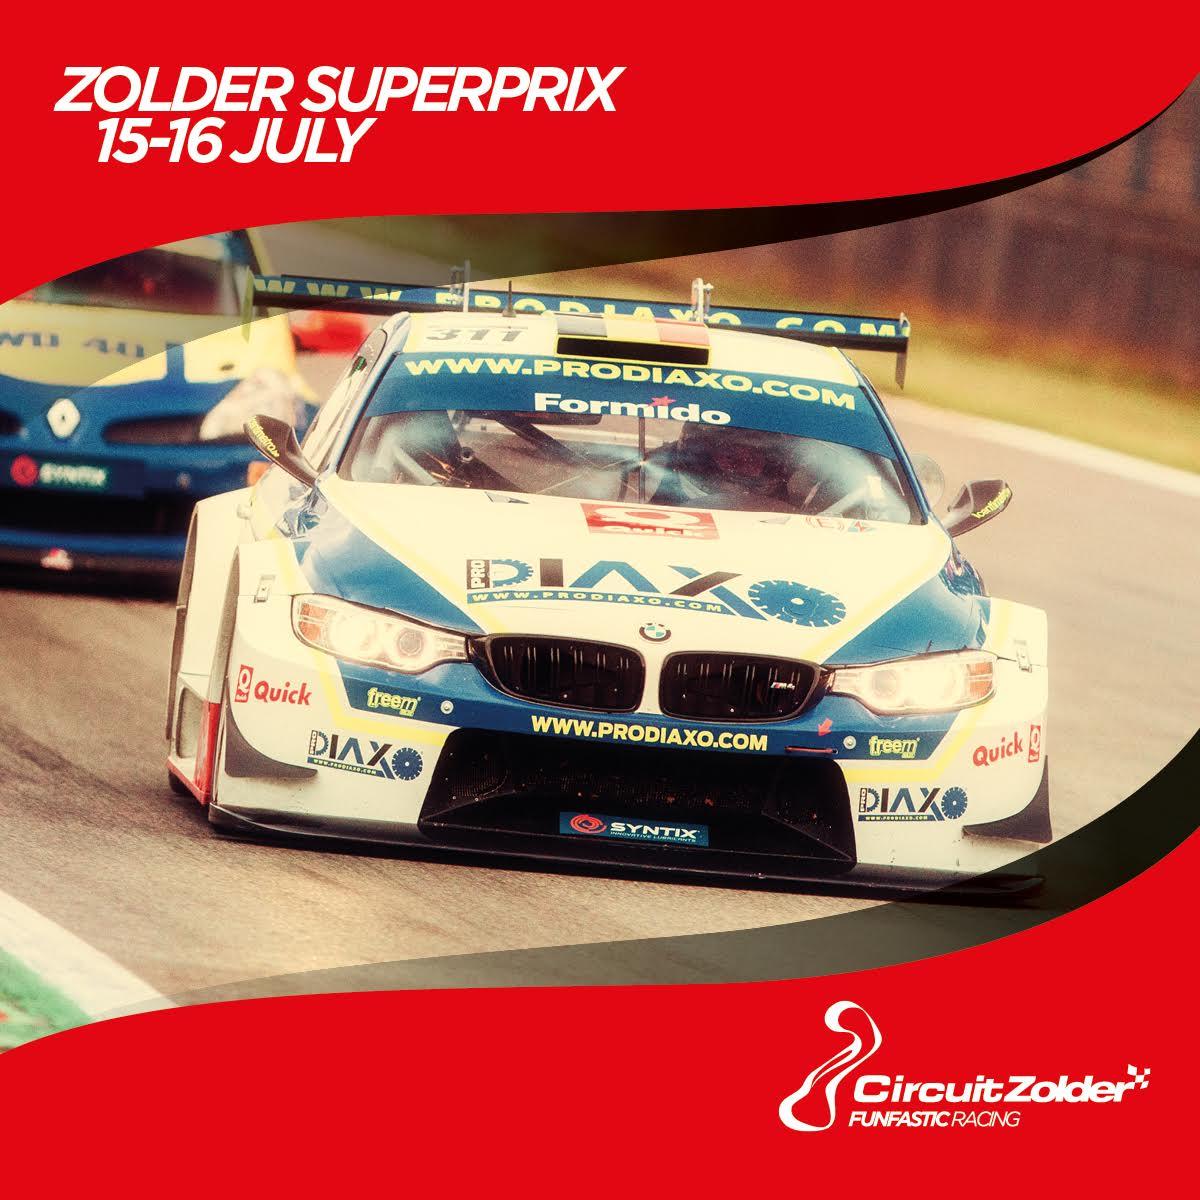 Circuito Zolder Belgica : Circuit zolder formula belgian grand prix belgian